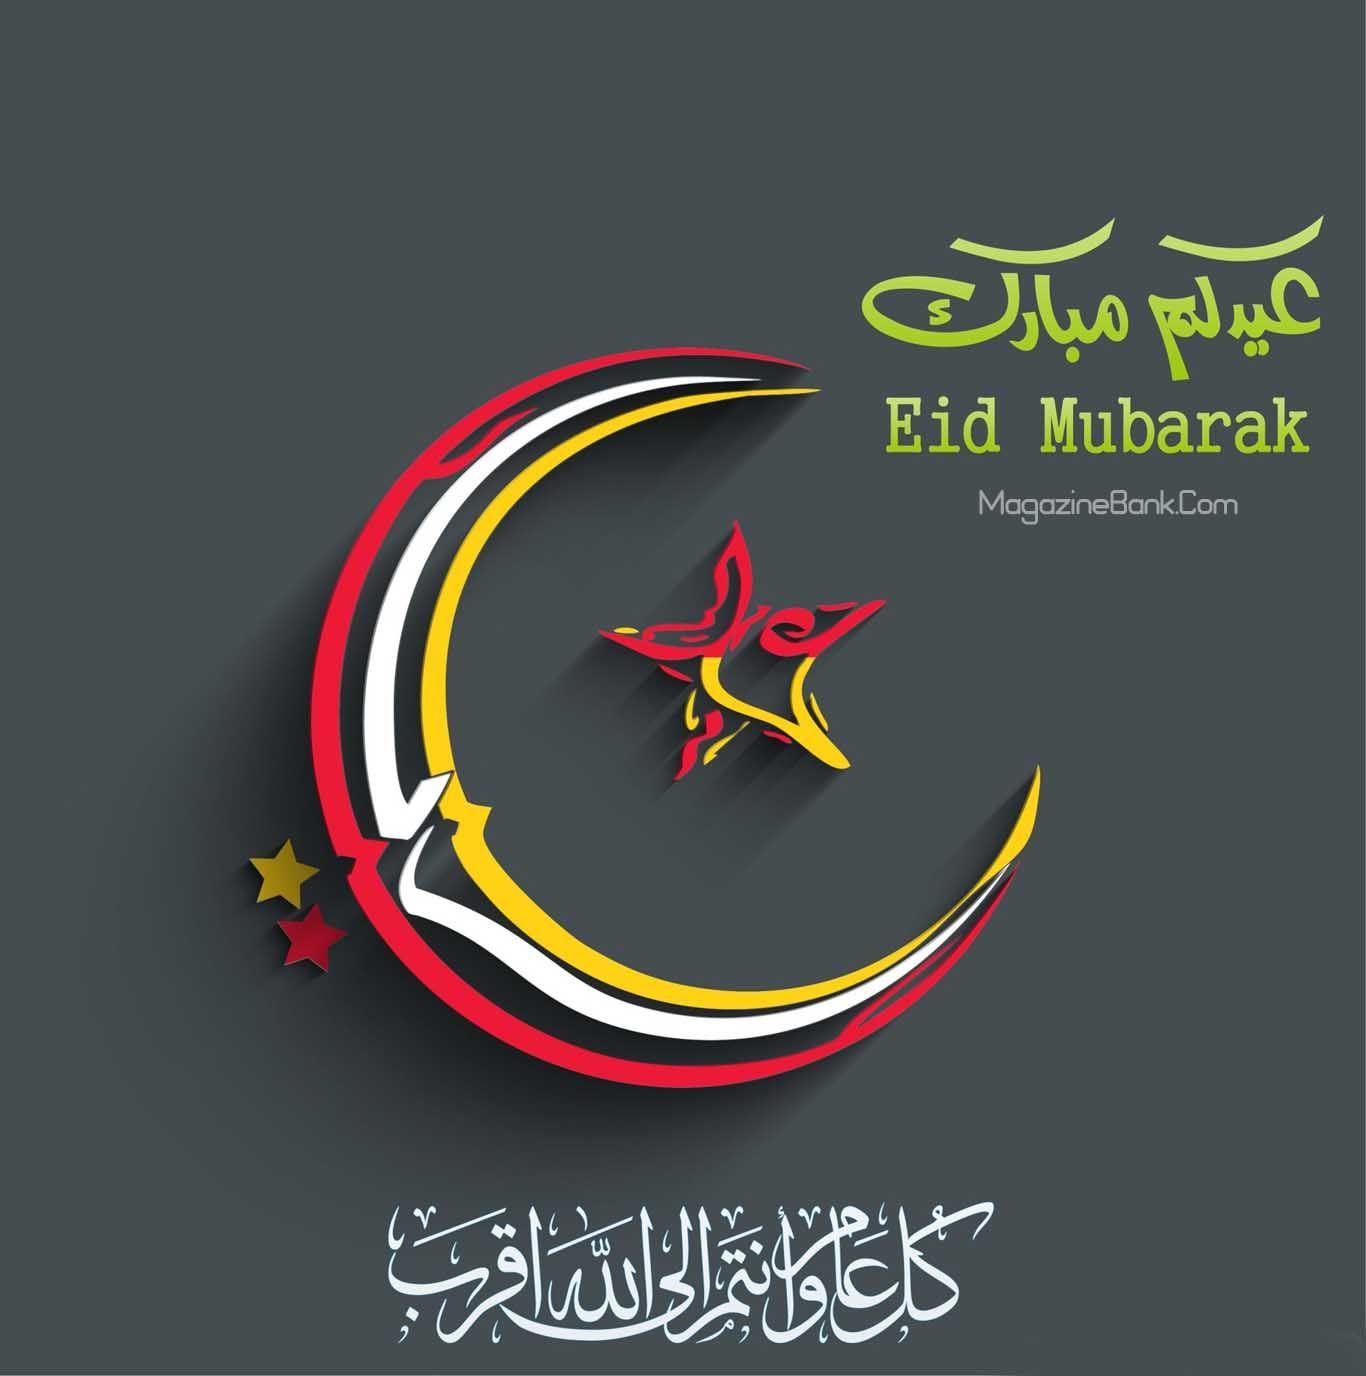 Eid Mubarak 2020 Wishes Quotes Banner Eid Al Fitr Id Mubarak Wishes Sms Status Greeting Happy Eid Mubarak Photos